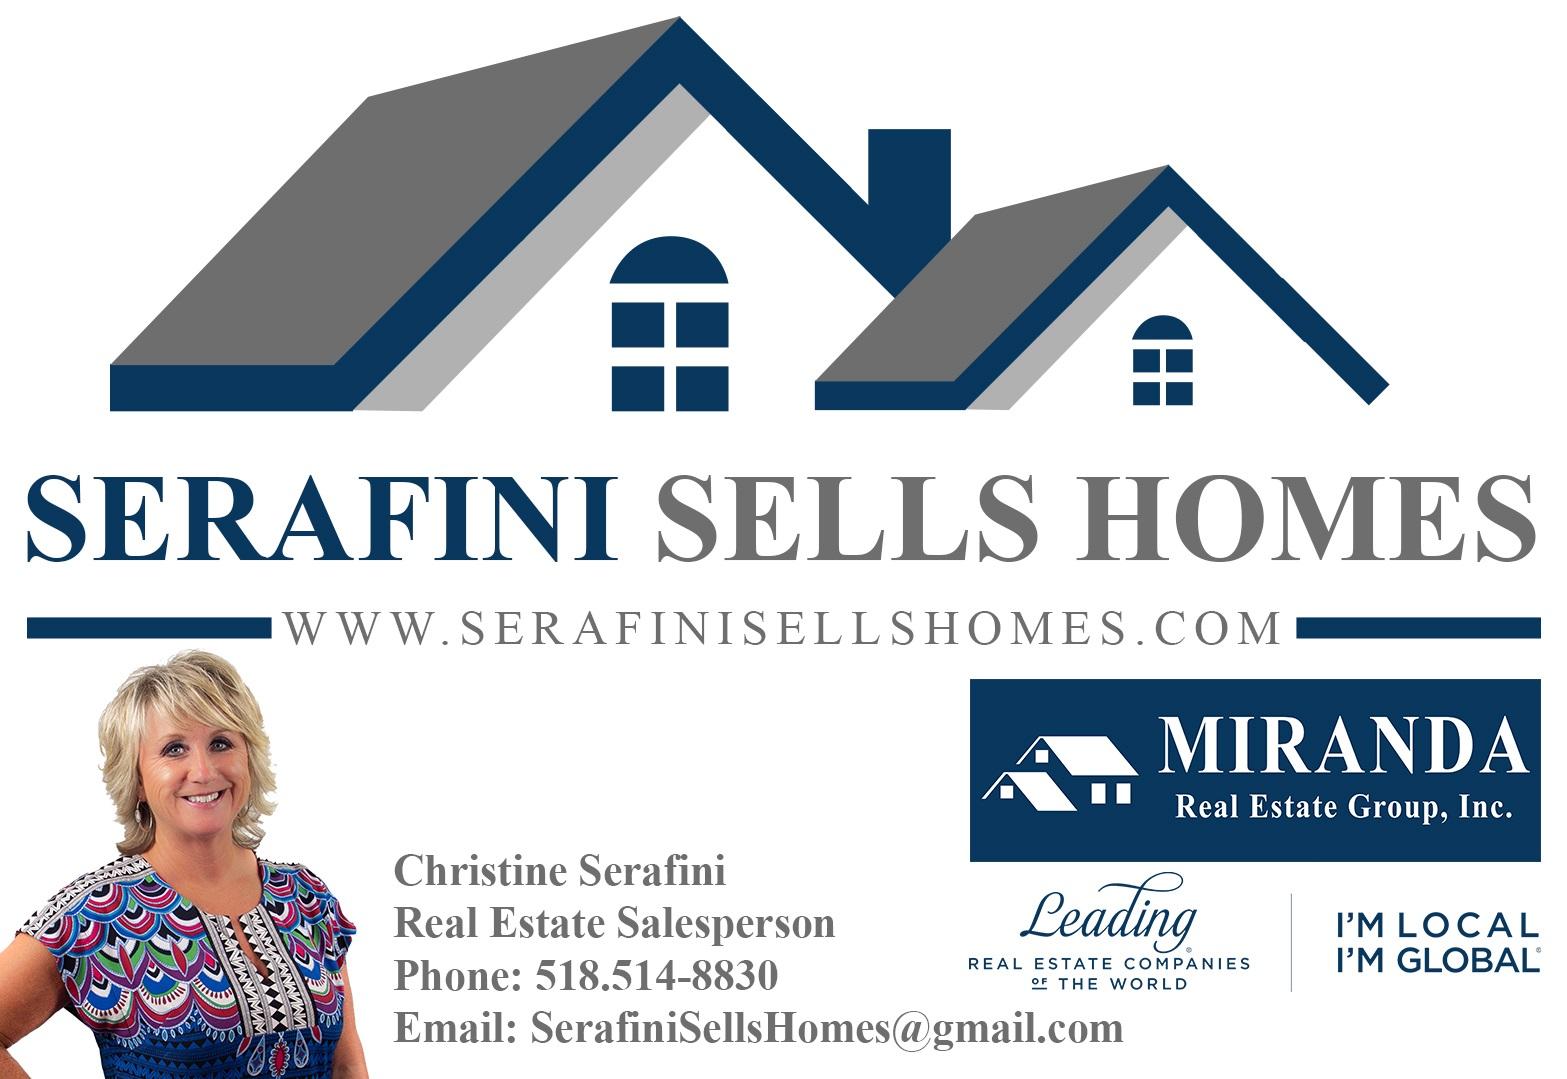 Serafini Sells Homes-Email Signature